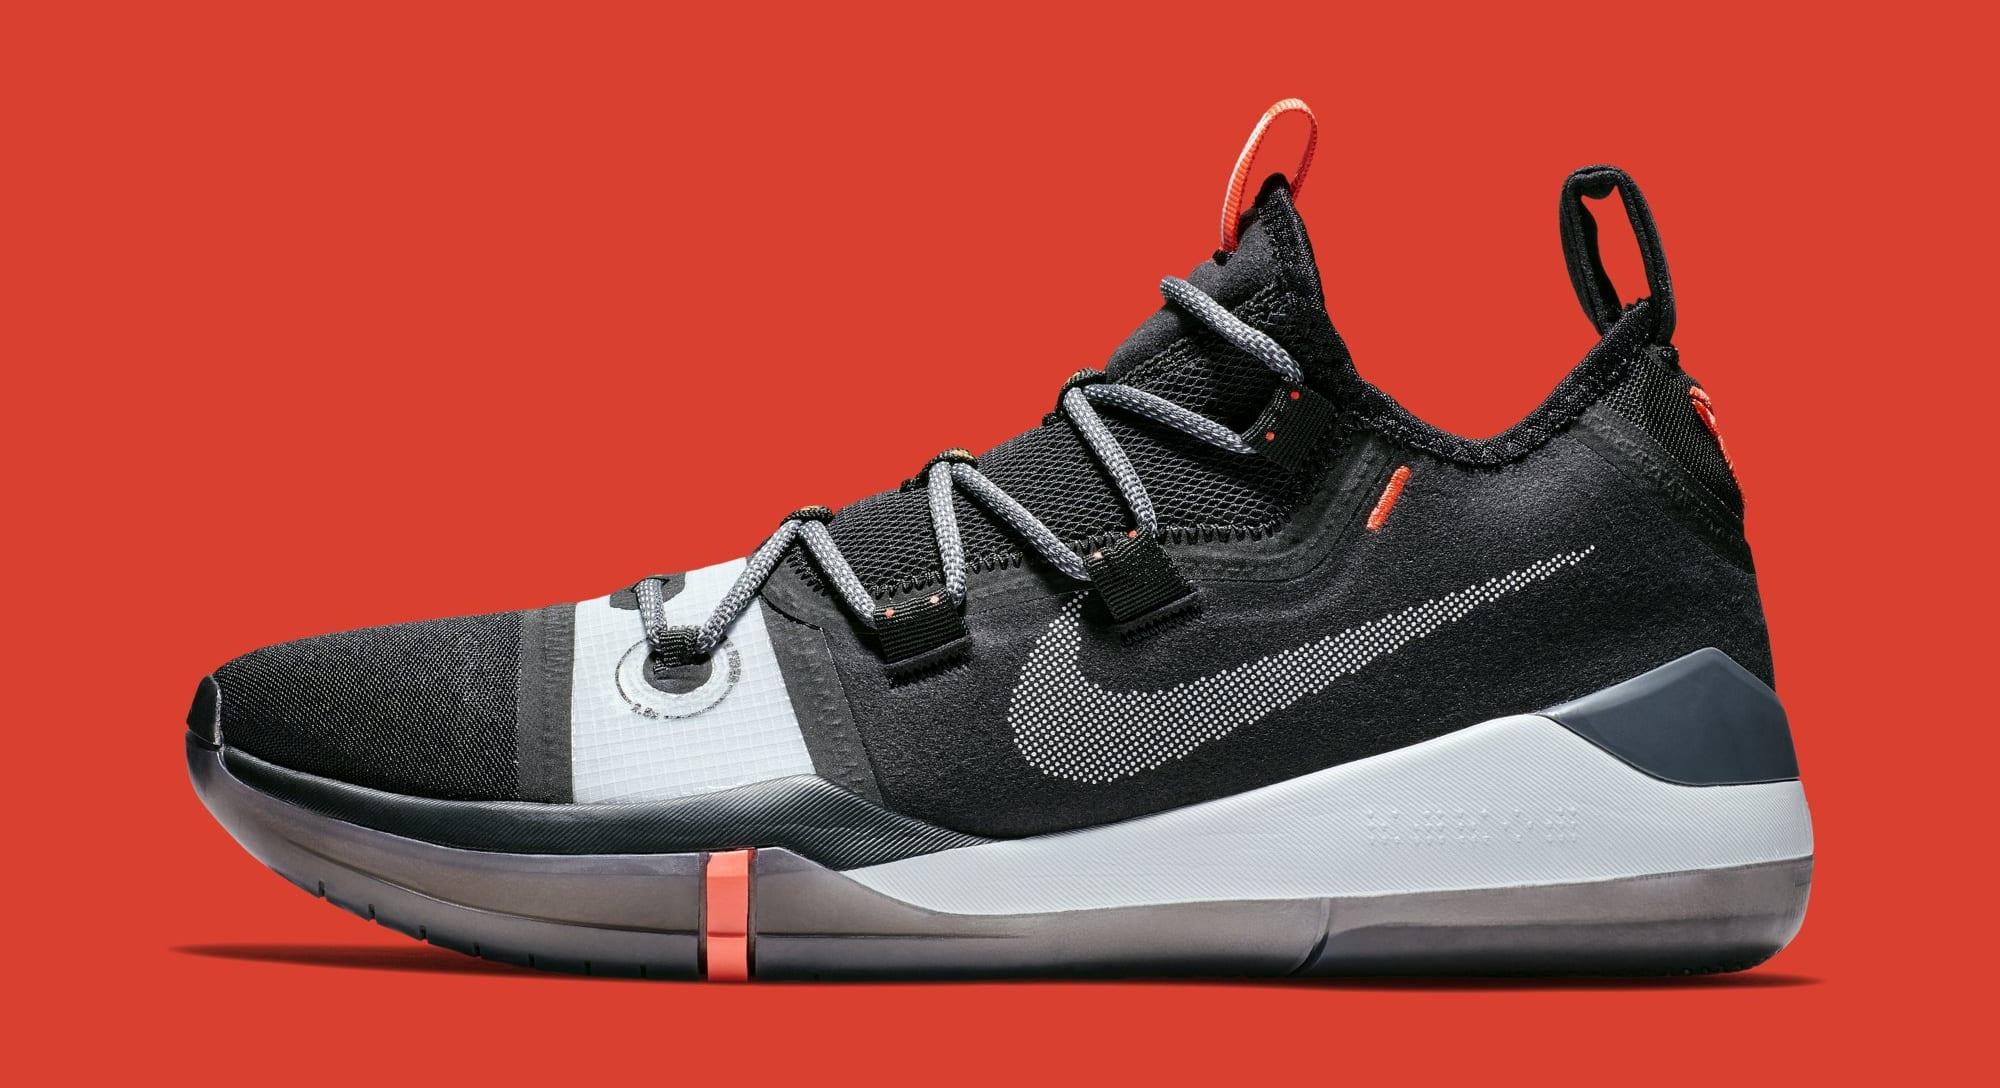 Nike Kobe AD 'Black/Multi' AV3555-001 (Lateral)